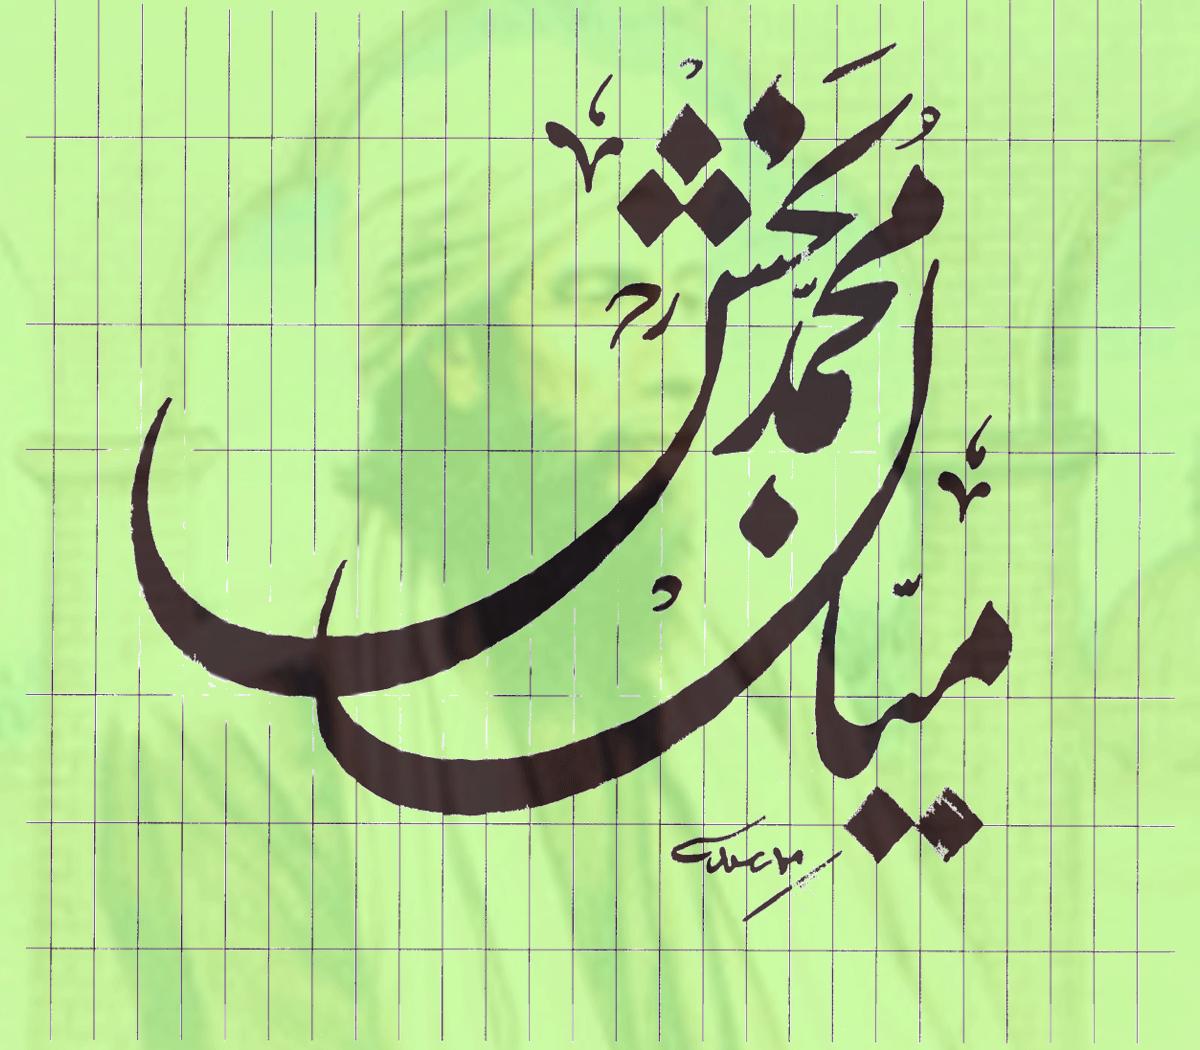 Sajjad 3d Name Wallpaper The Name Of Mian Muhammad Bakhsh In Urdu Nastaleeq Jadeed